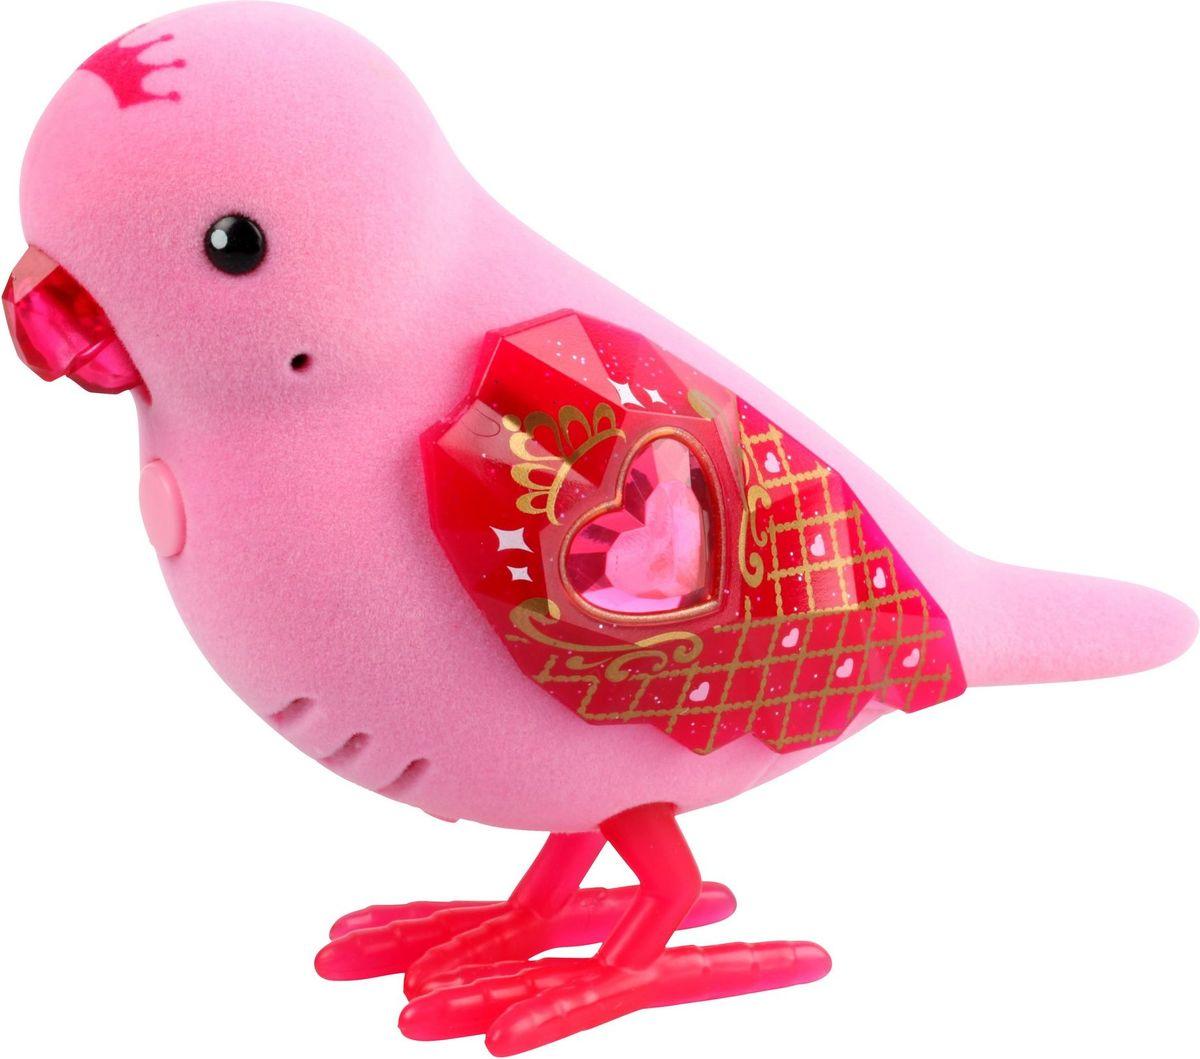 Little Live Pets Интерактивная игрушка Птичка Princess Gemma - Интерактивные игрушки